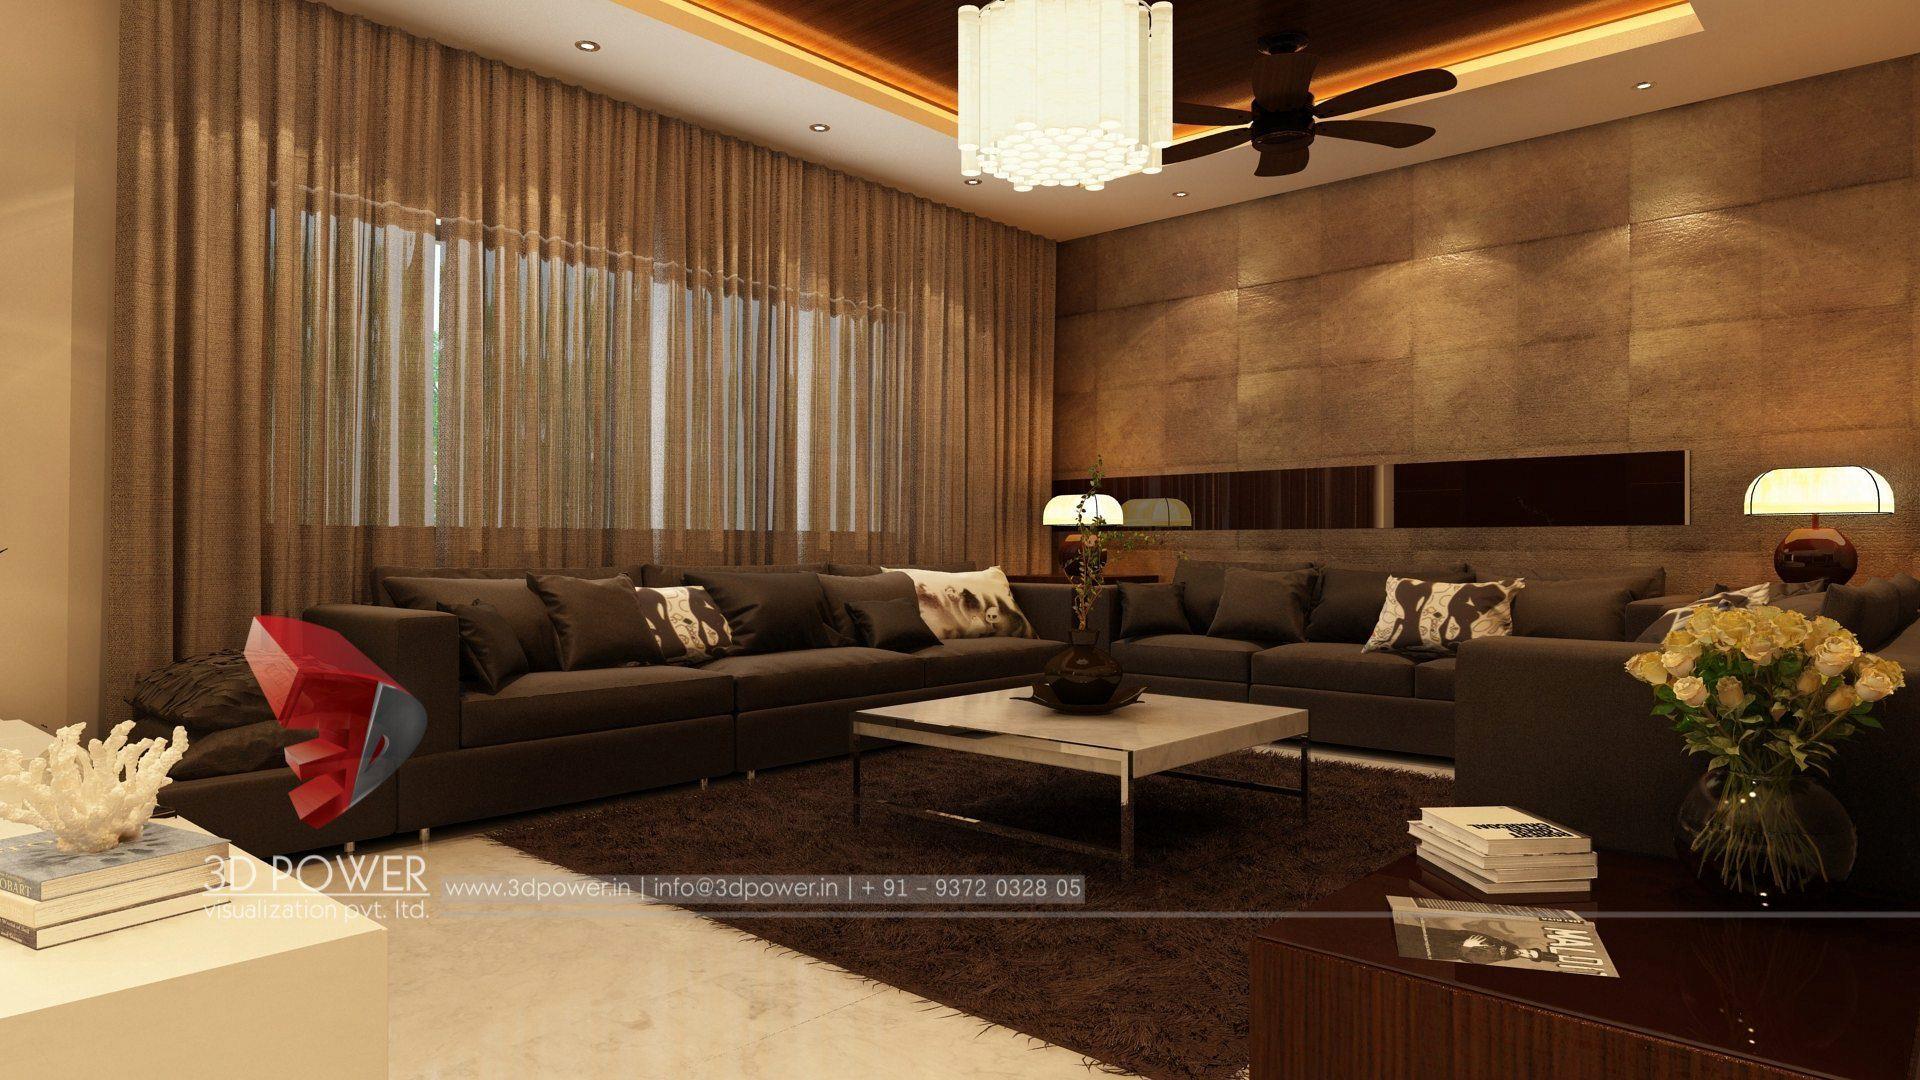 3D Interior Design & Rendering Services